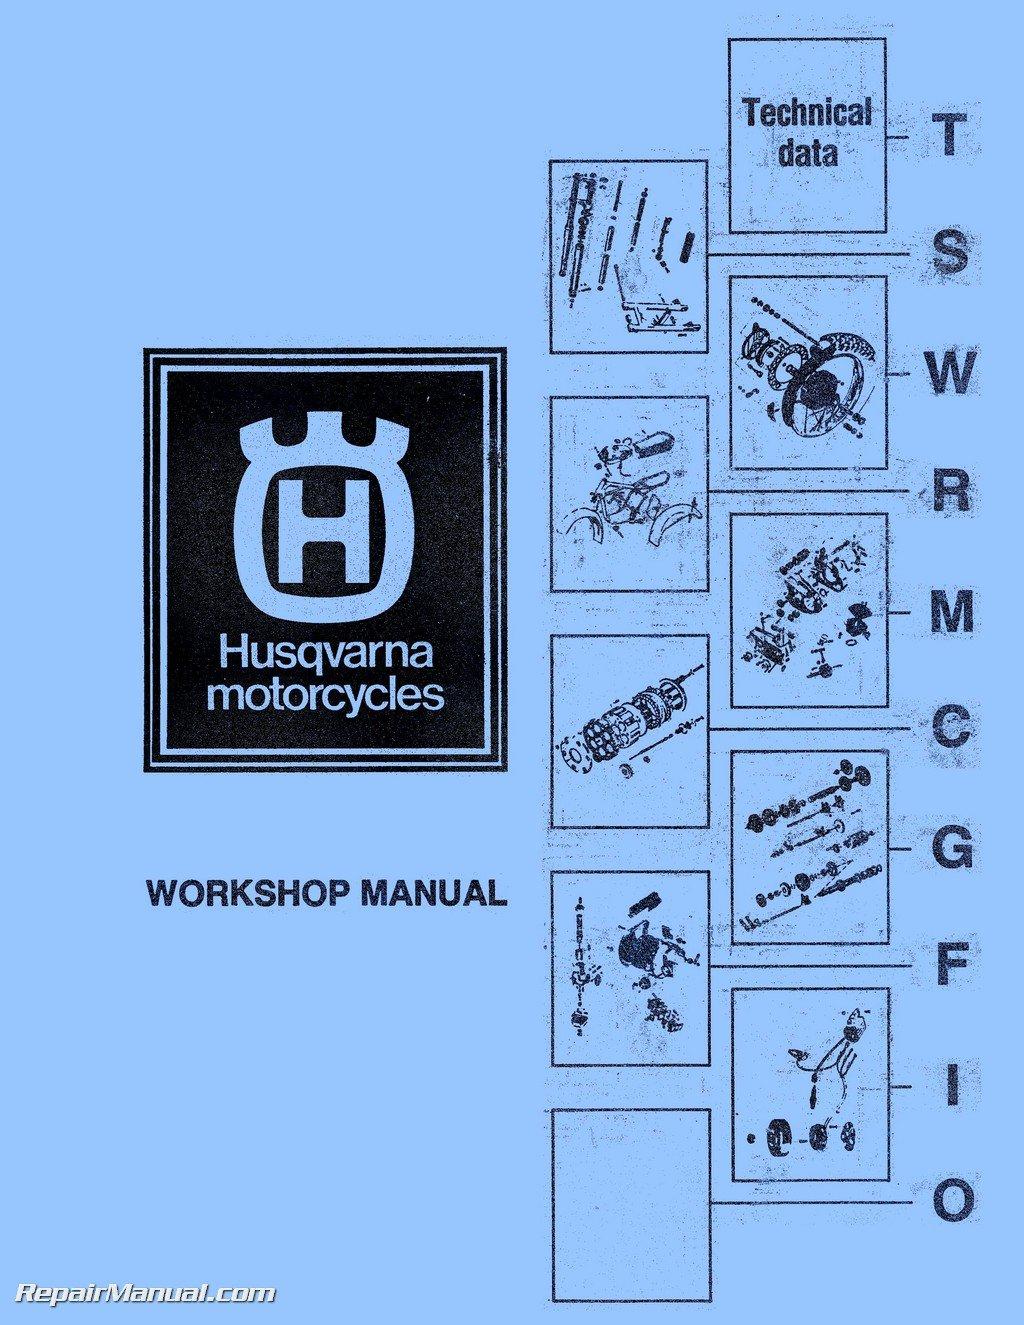 HUSQ-1974-1976 Husqvarna CR WR RT Motorcycle Manual 125 175 250 360 390 400  450 460cc 1973-1979: Manufacturer: Amazon.com: Books